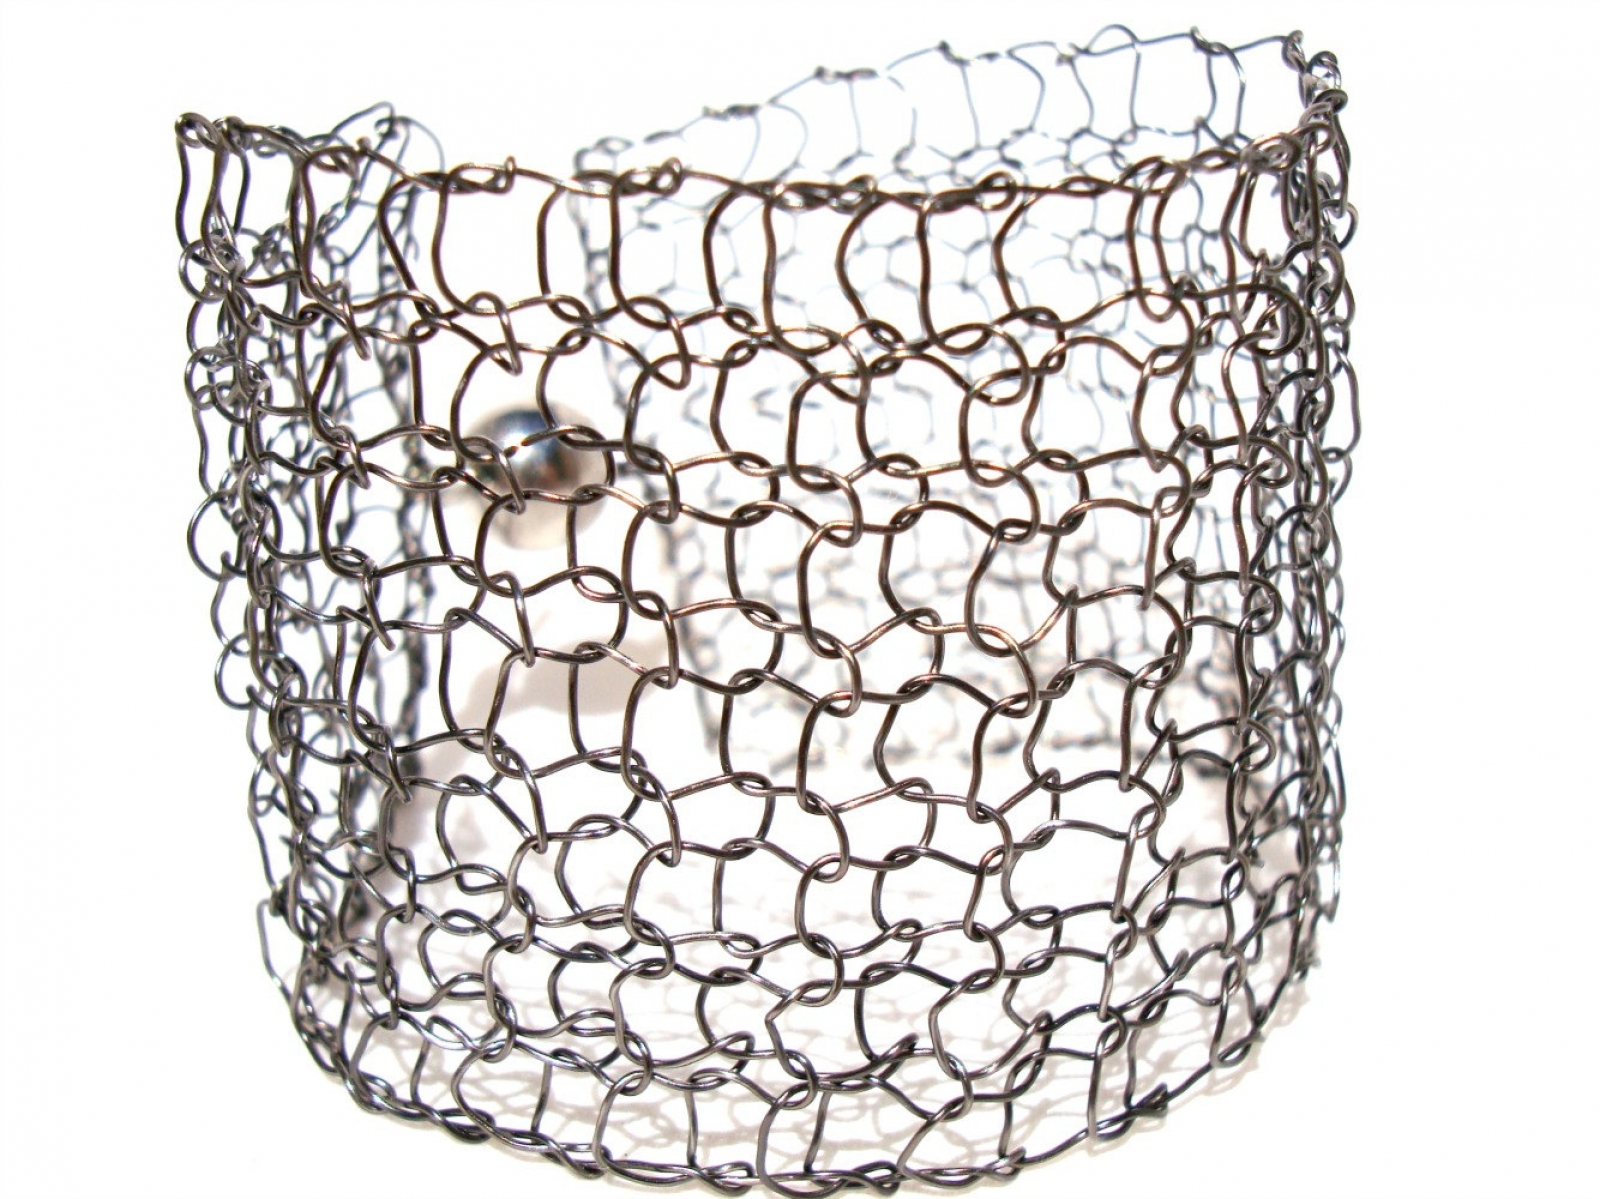 Metallic Cuff Bracelet Simple Chic Knitted Wire Mesh Arm Cuff Slate ...